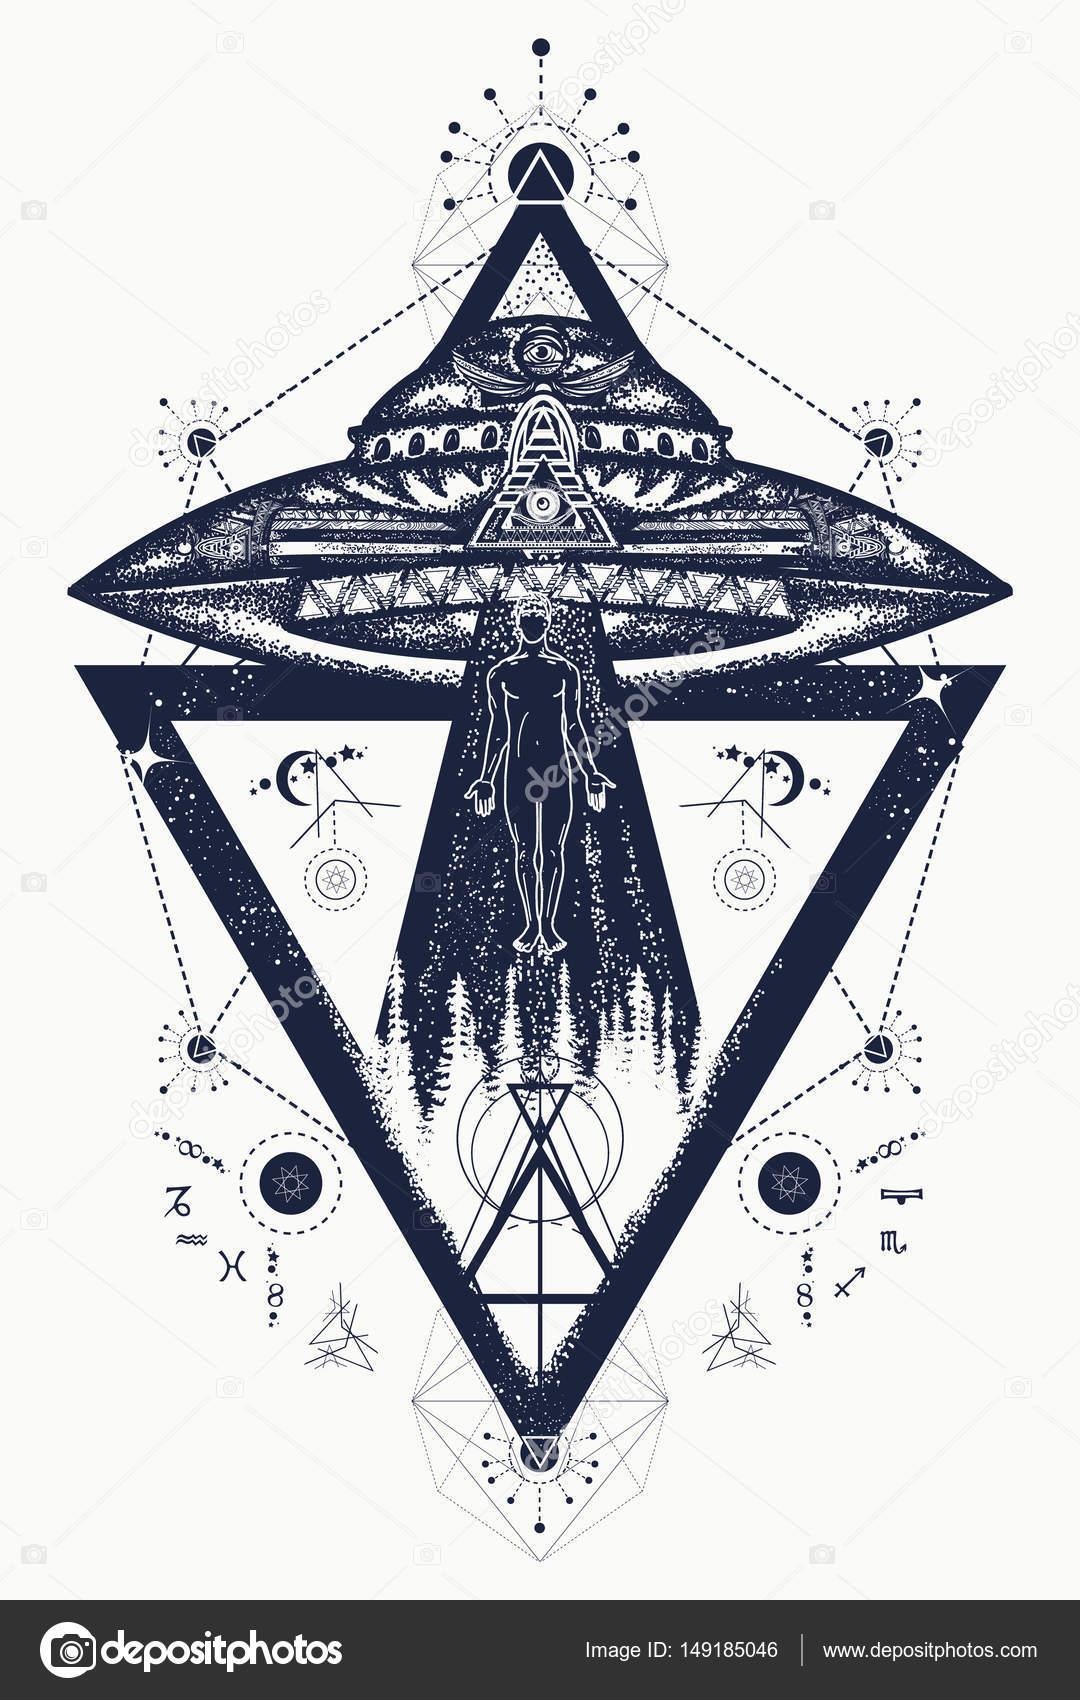 Imágenes Ovni Tattoo Ovni Extraterrestres Persona Secuestrada